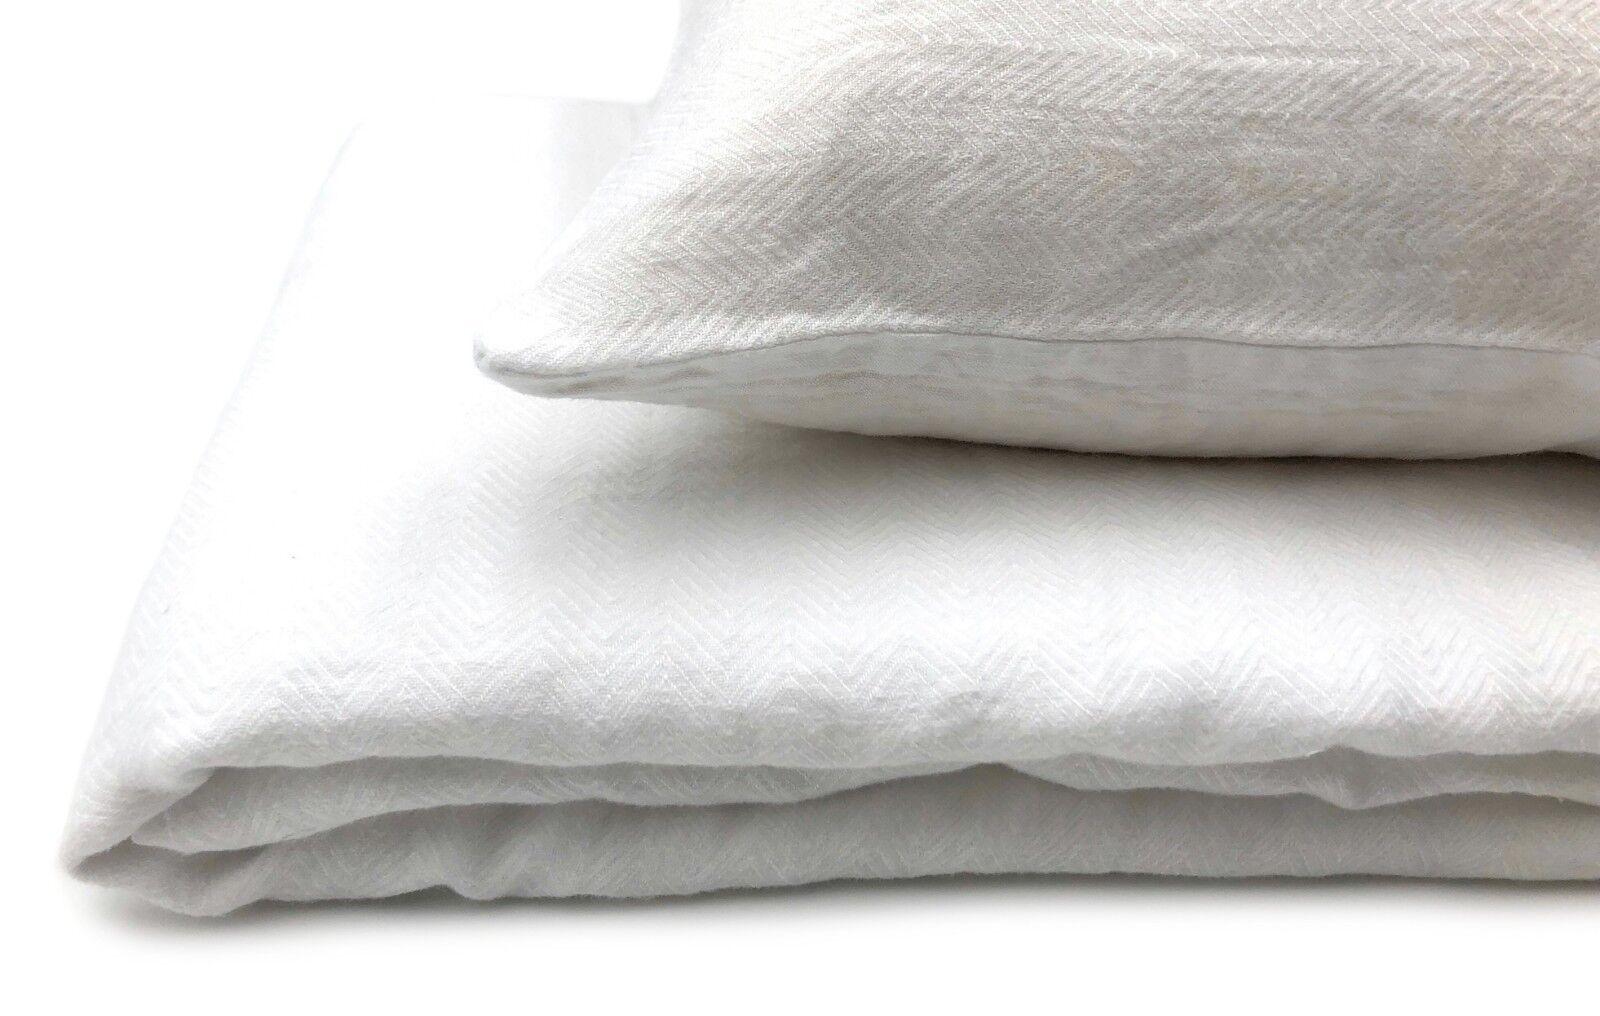 Jacquard Leinen  Stonewashed  Bettwäsche-Set (135x200, 40x80 cm) Classic White